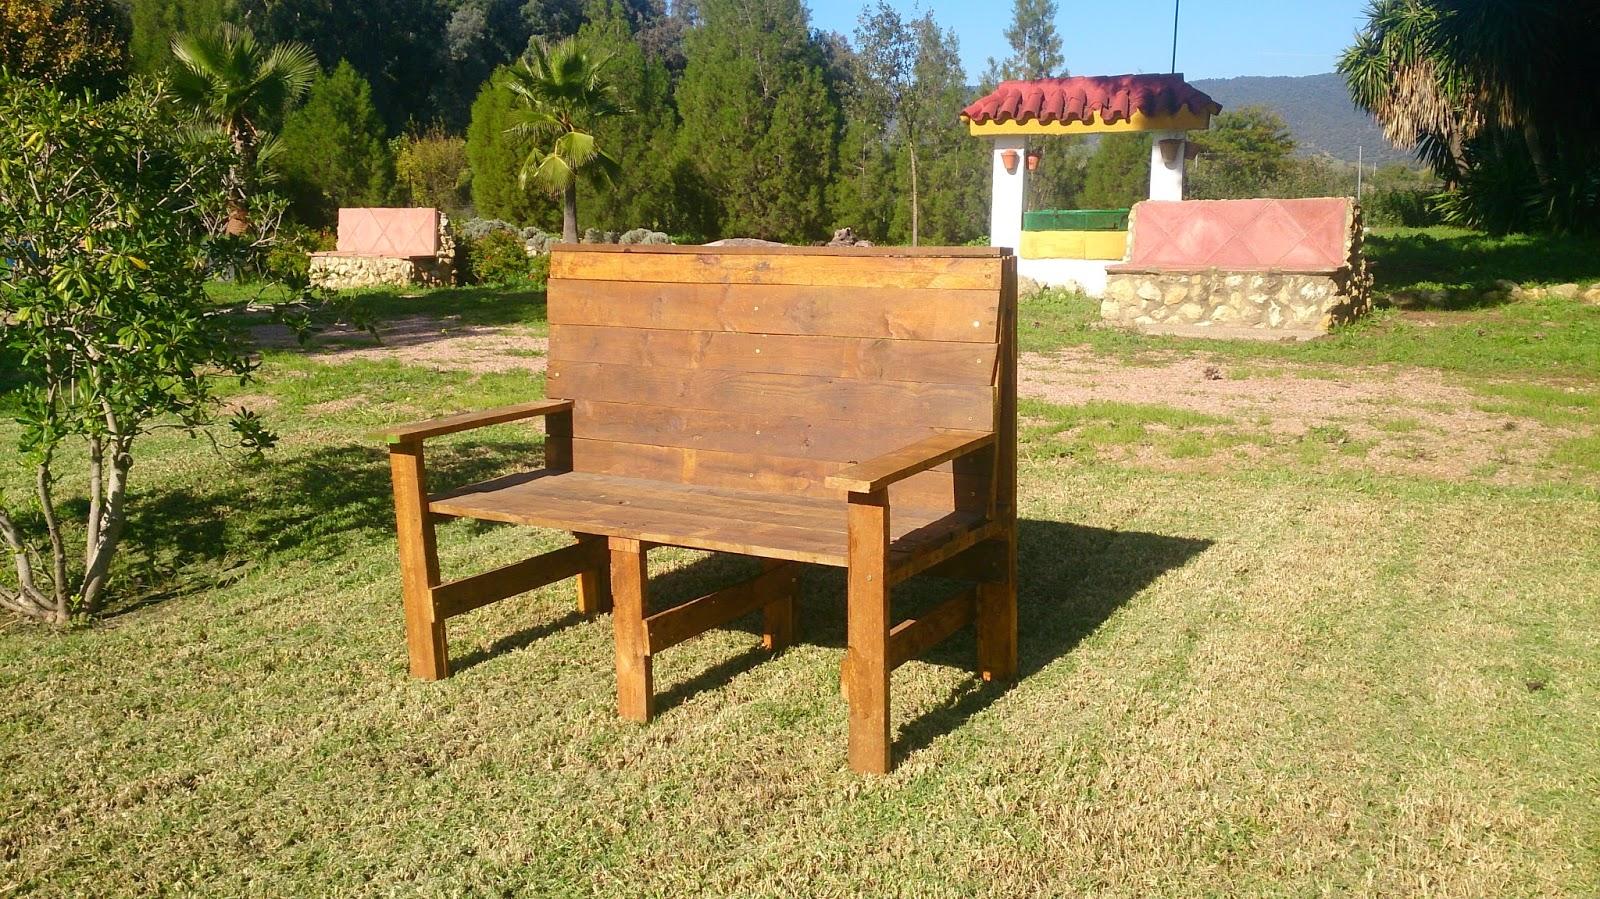 Aguilarejo decoraci n encuadernaci n madera y flor - Materiales para jardines ...